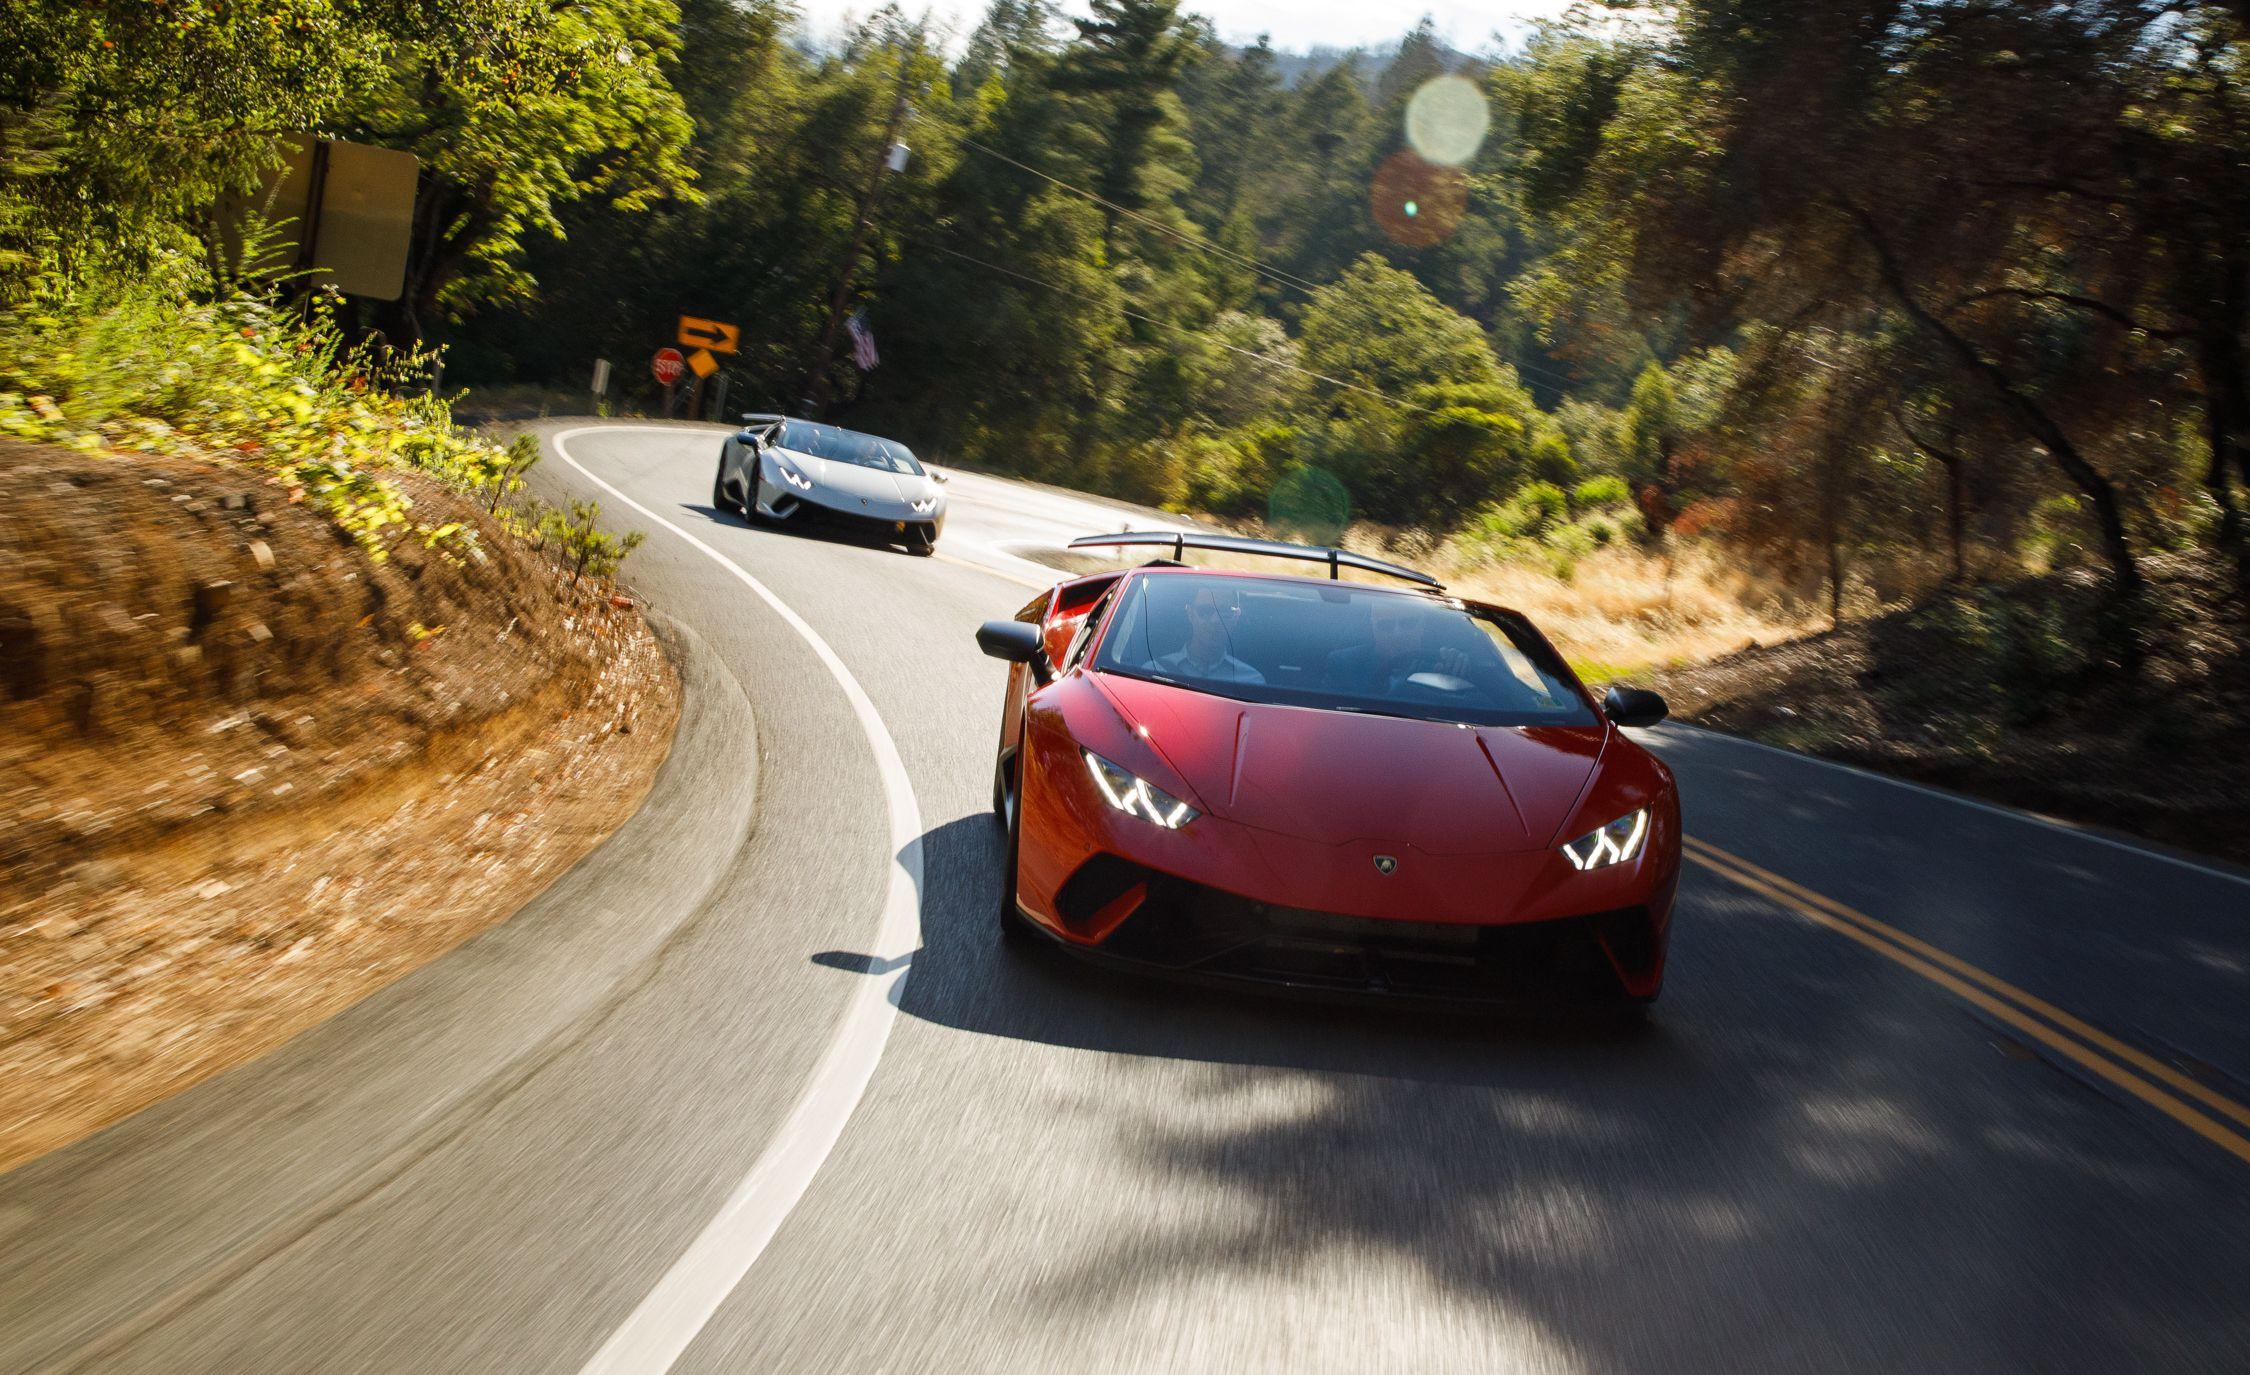 2019 Lamborghini Huracan Performante Spyder Wallpapers 96 Hd